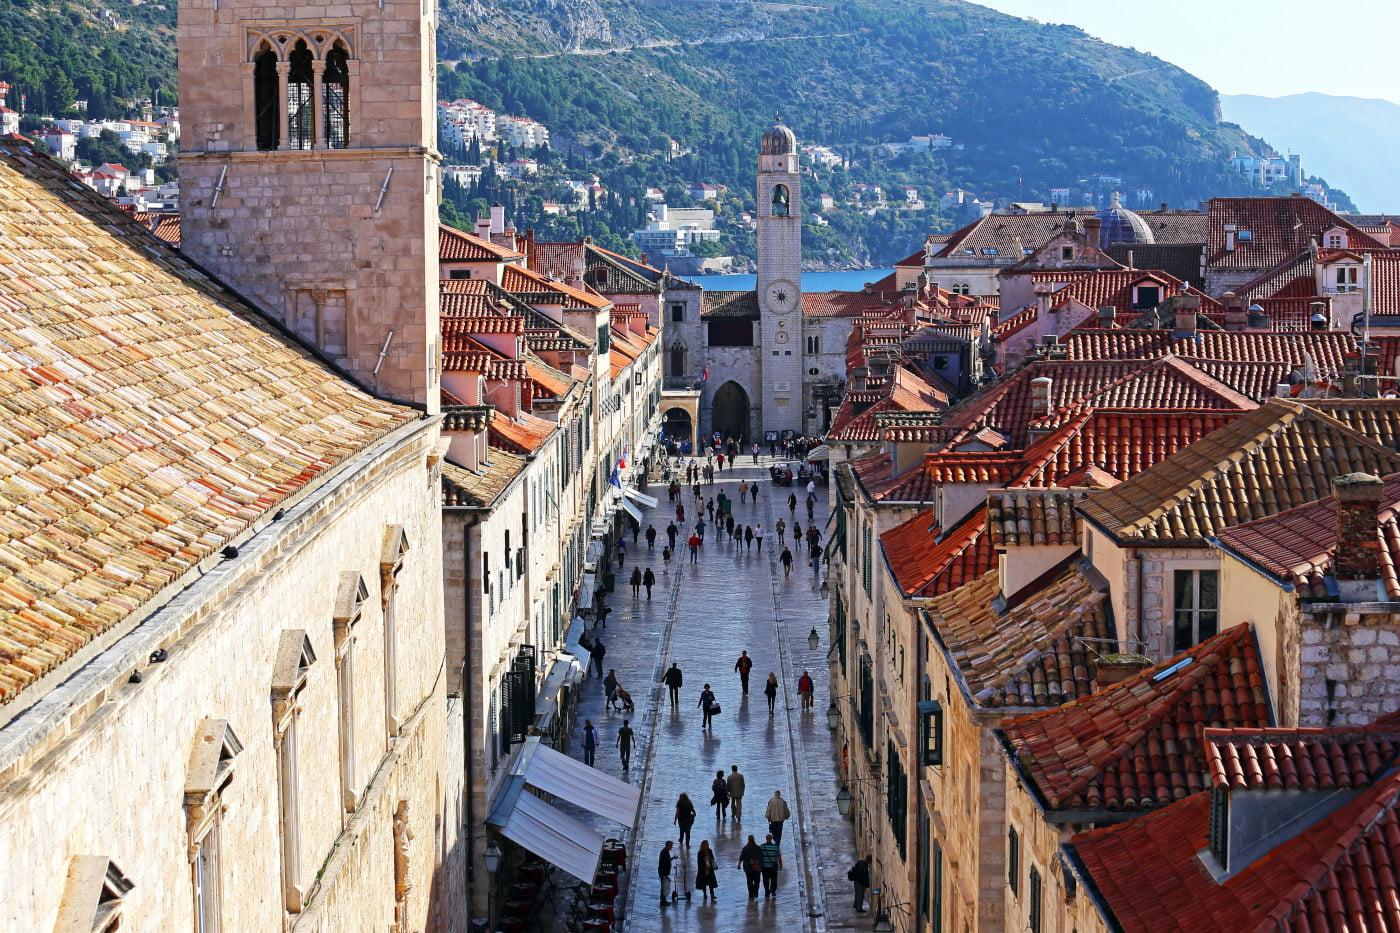 Stradun Main Street of Dubrovnik